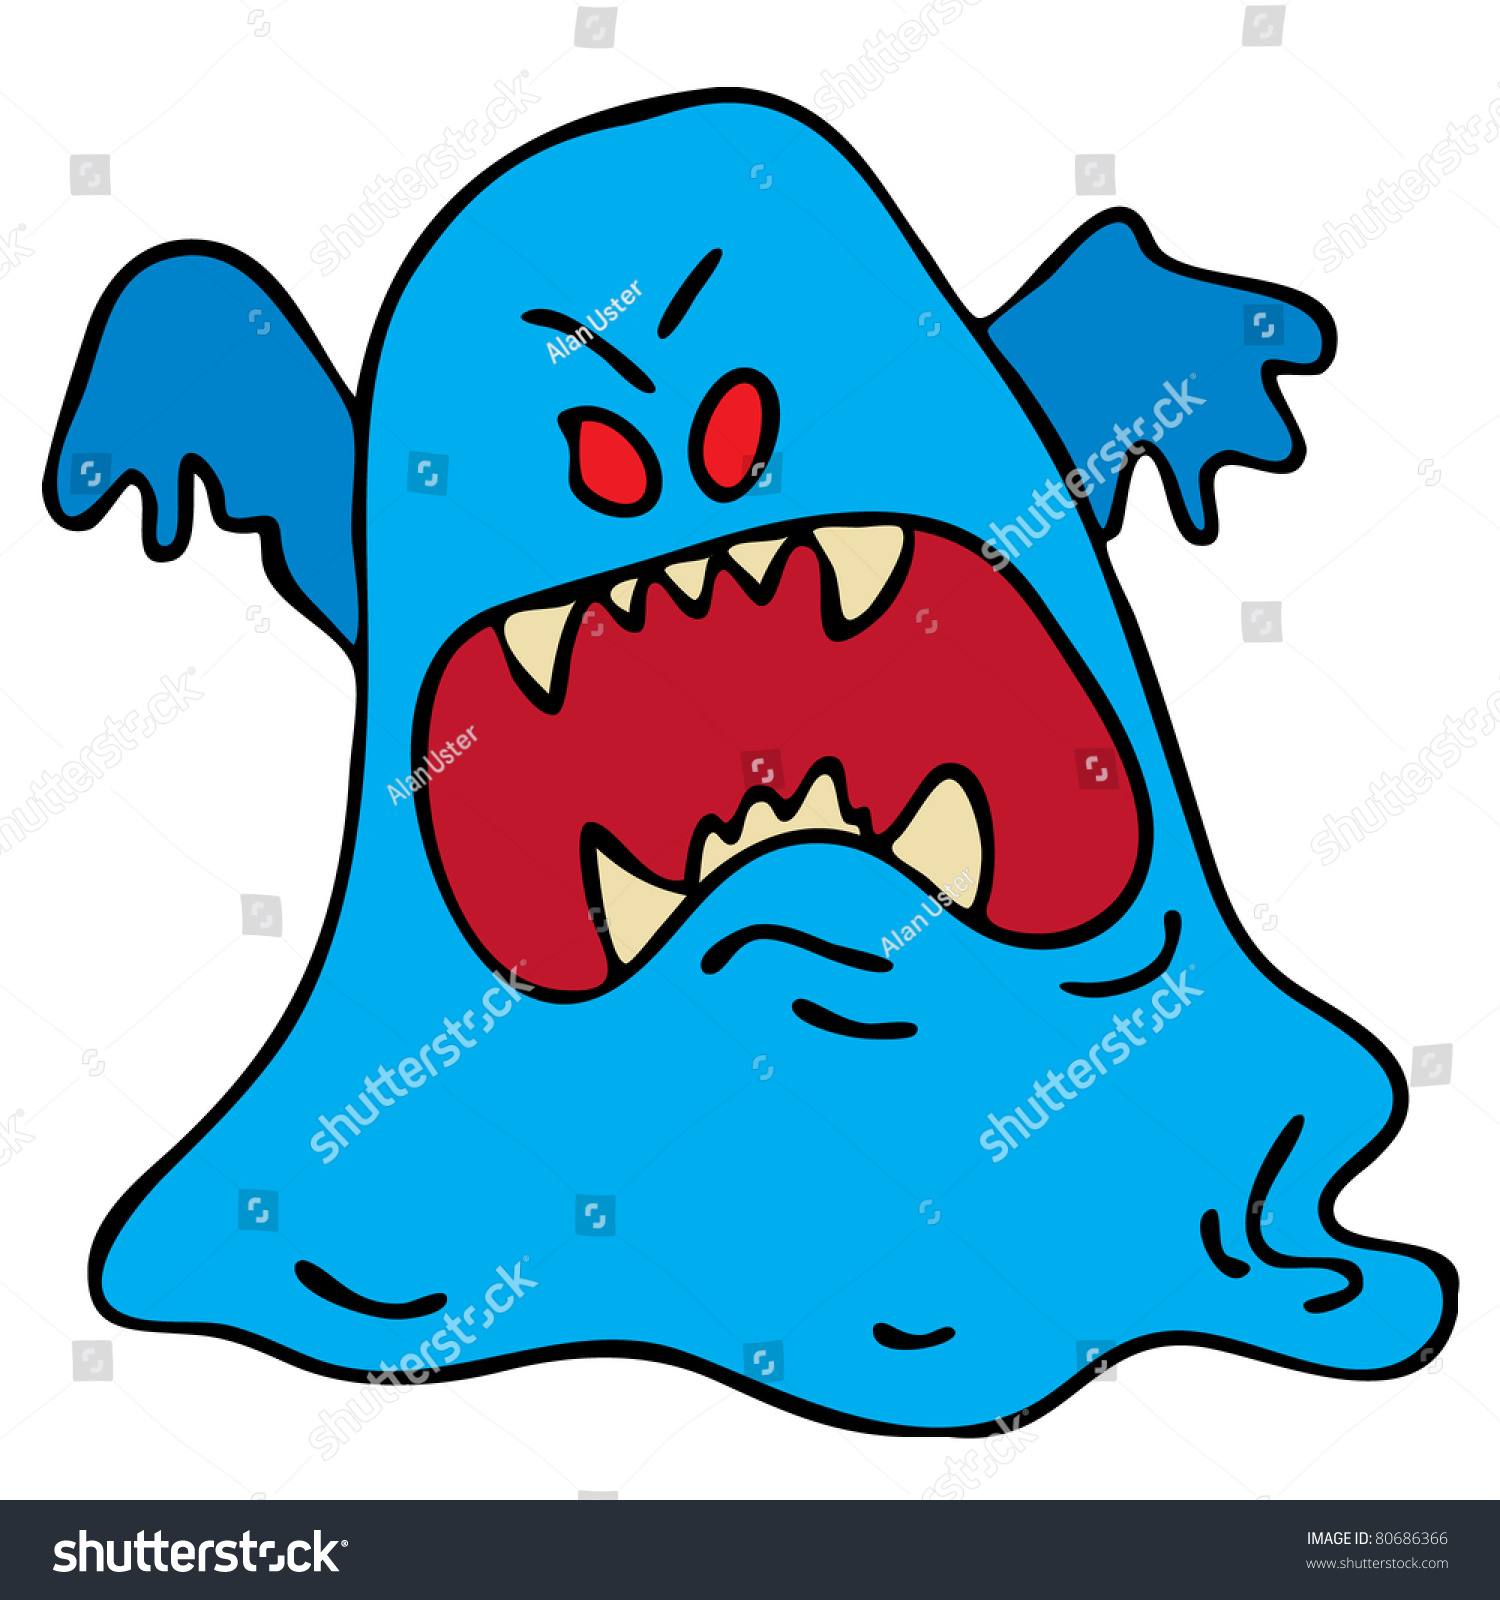 Cartoon Ghost Stock Vector 80686366 - Shutterstock